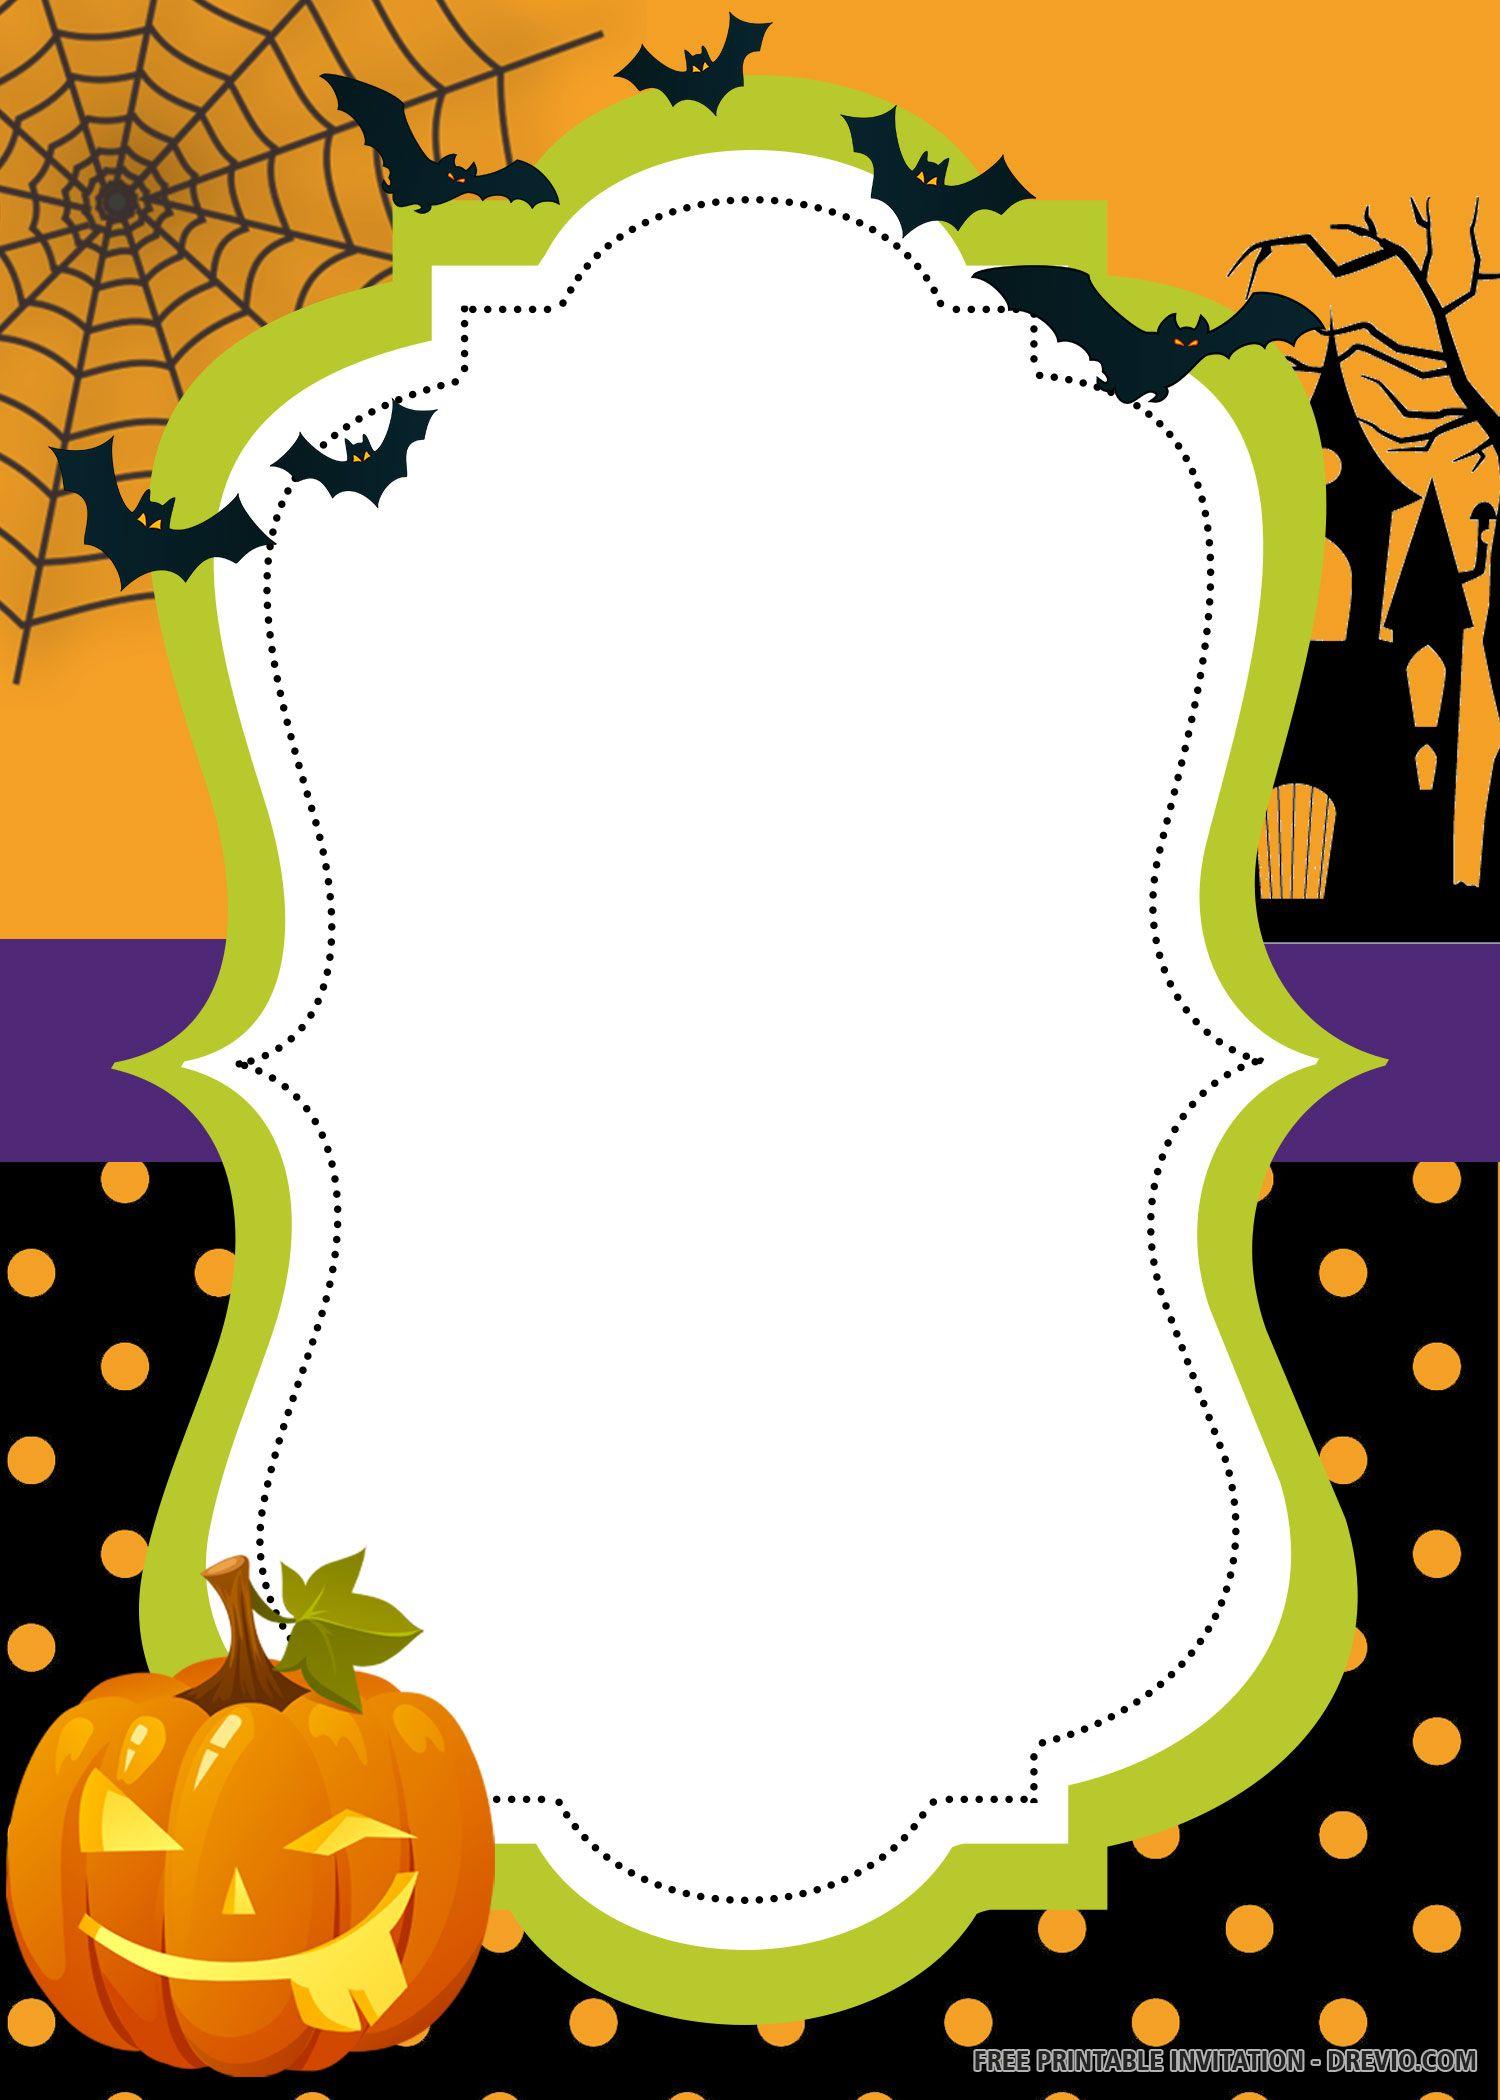 Free Printable Halloween Invitation Templates Halloween Invitation Templates Free Printable Halloween Invitations Printable Halloween Invitations